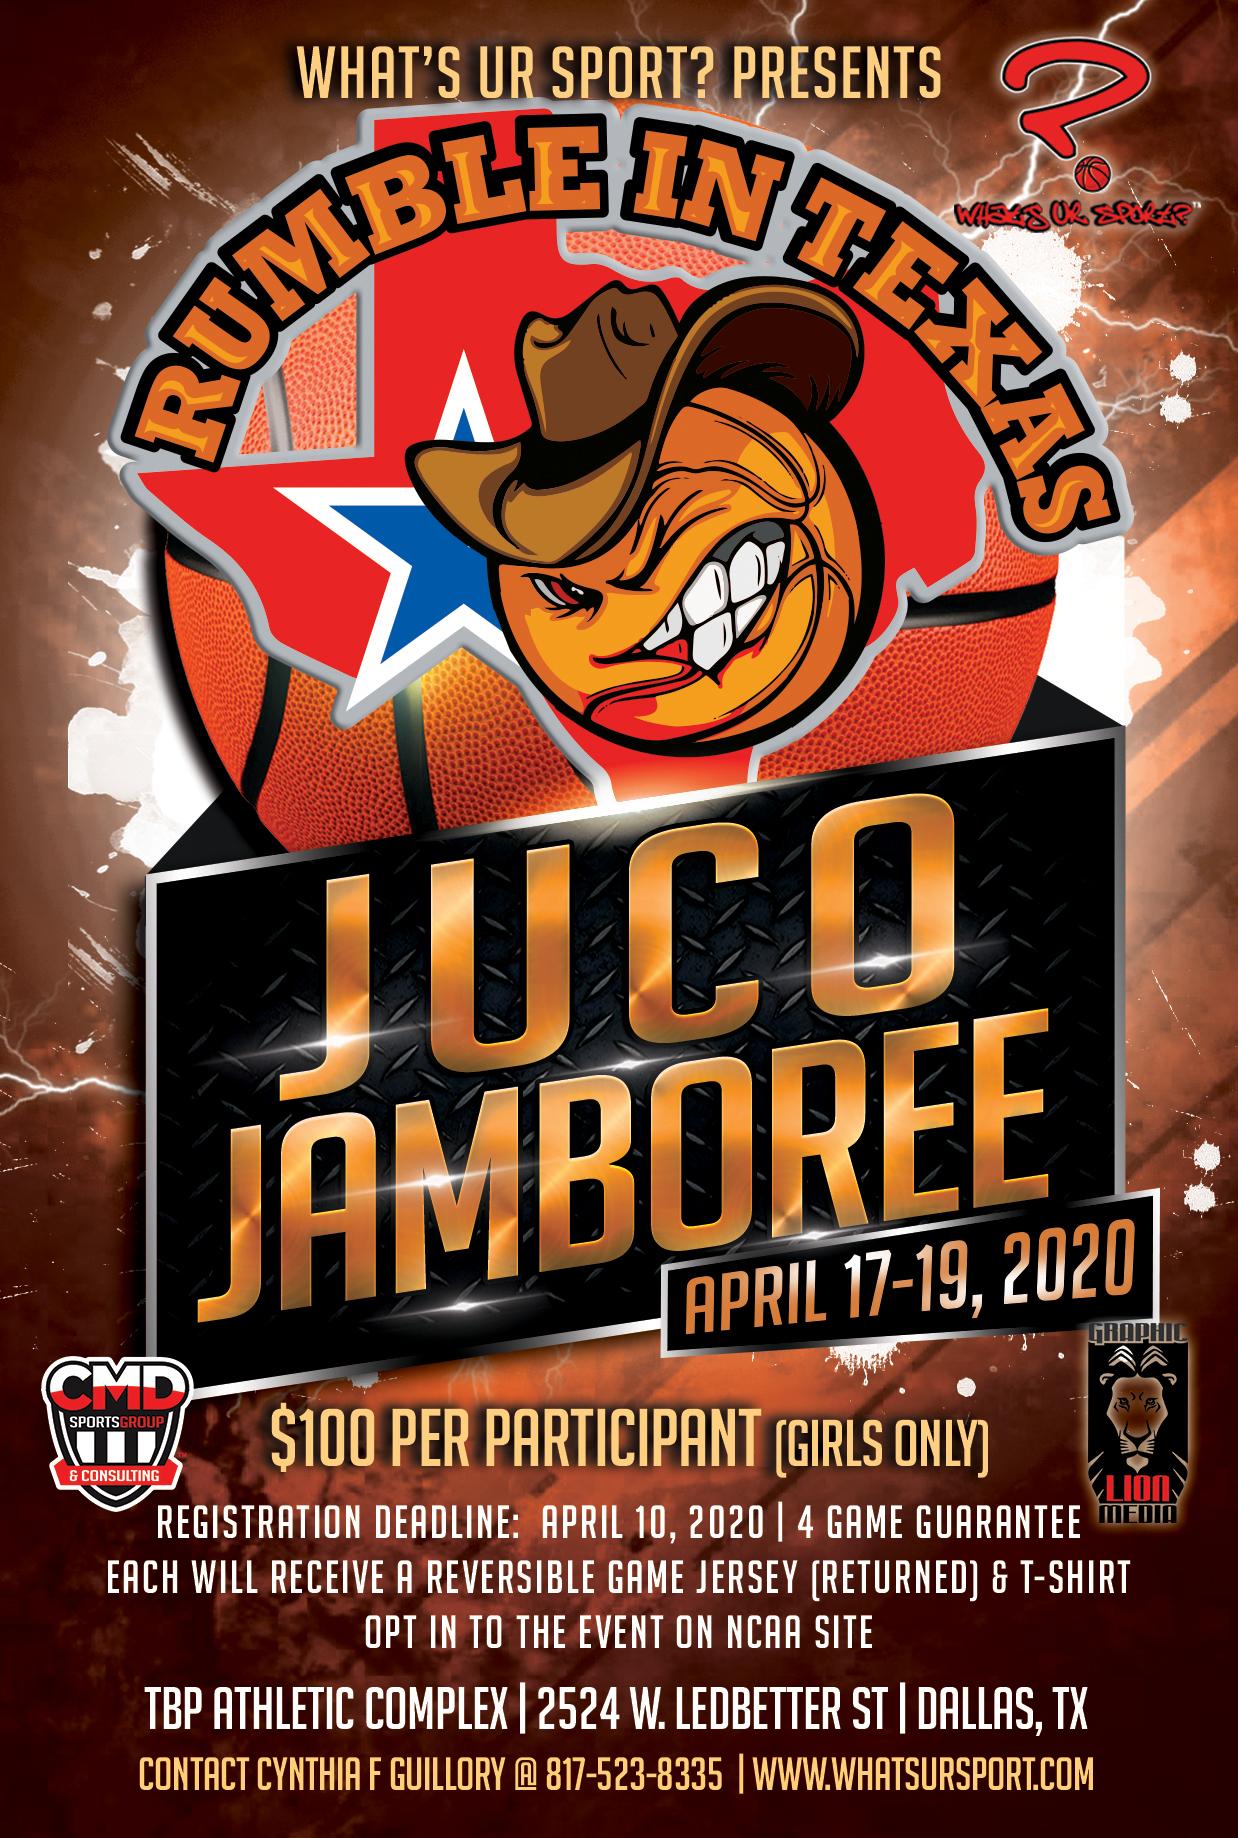 Rumble in Texas JUCO Jamboree